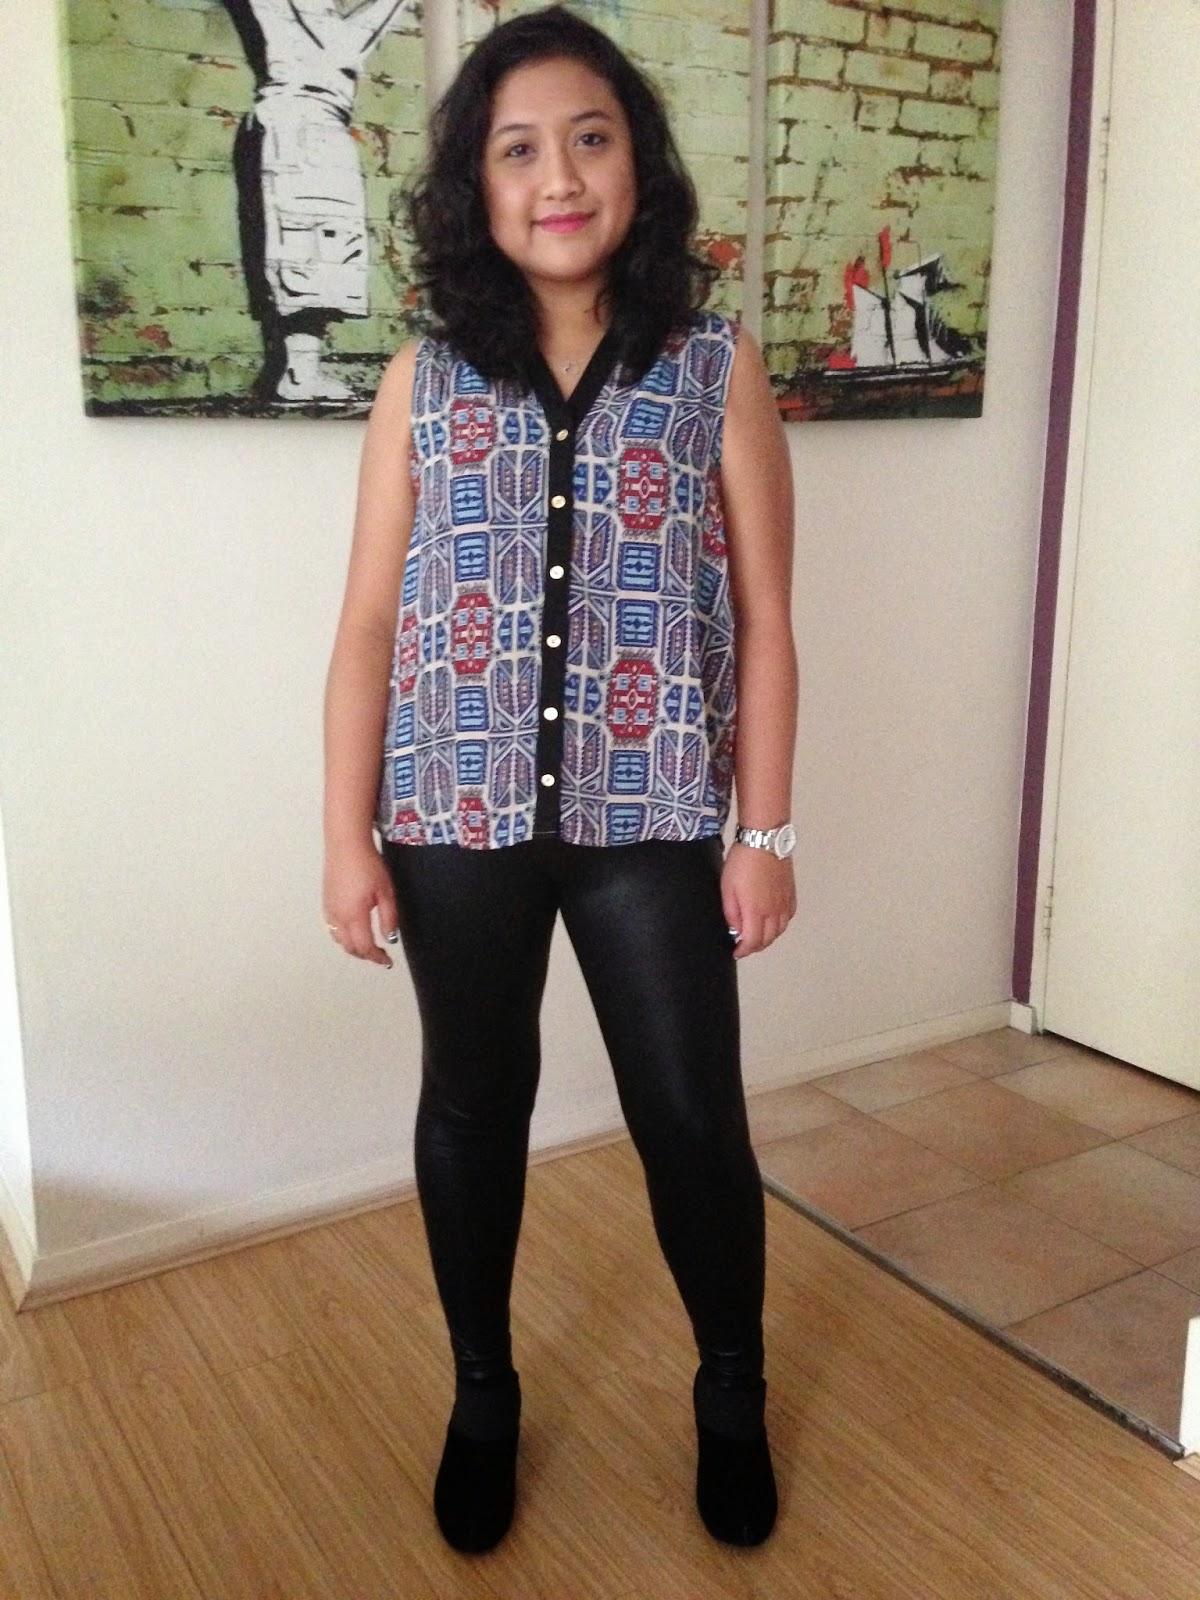 TEMT blouse, leather look leggings